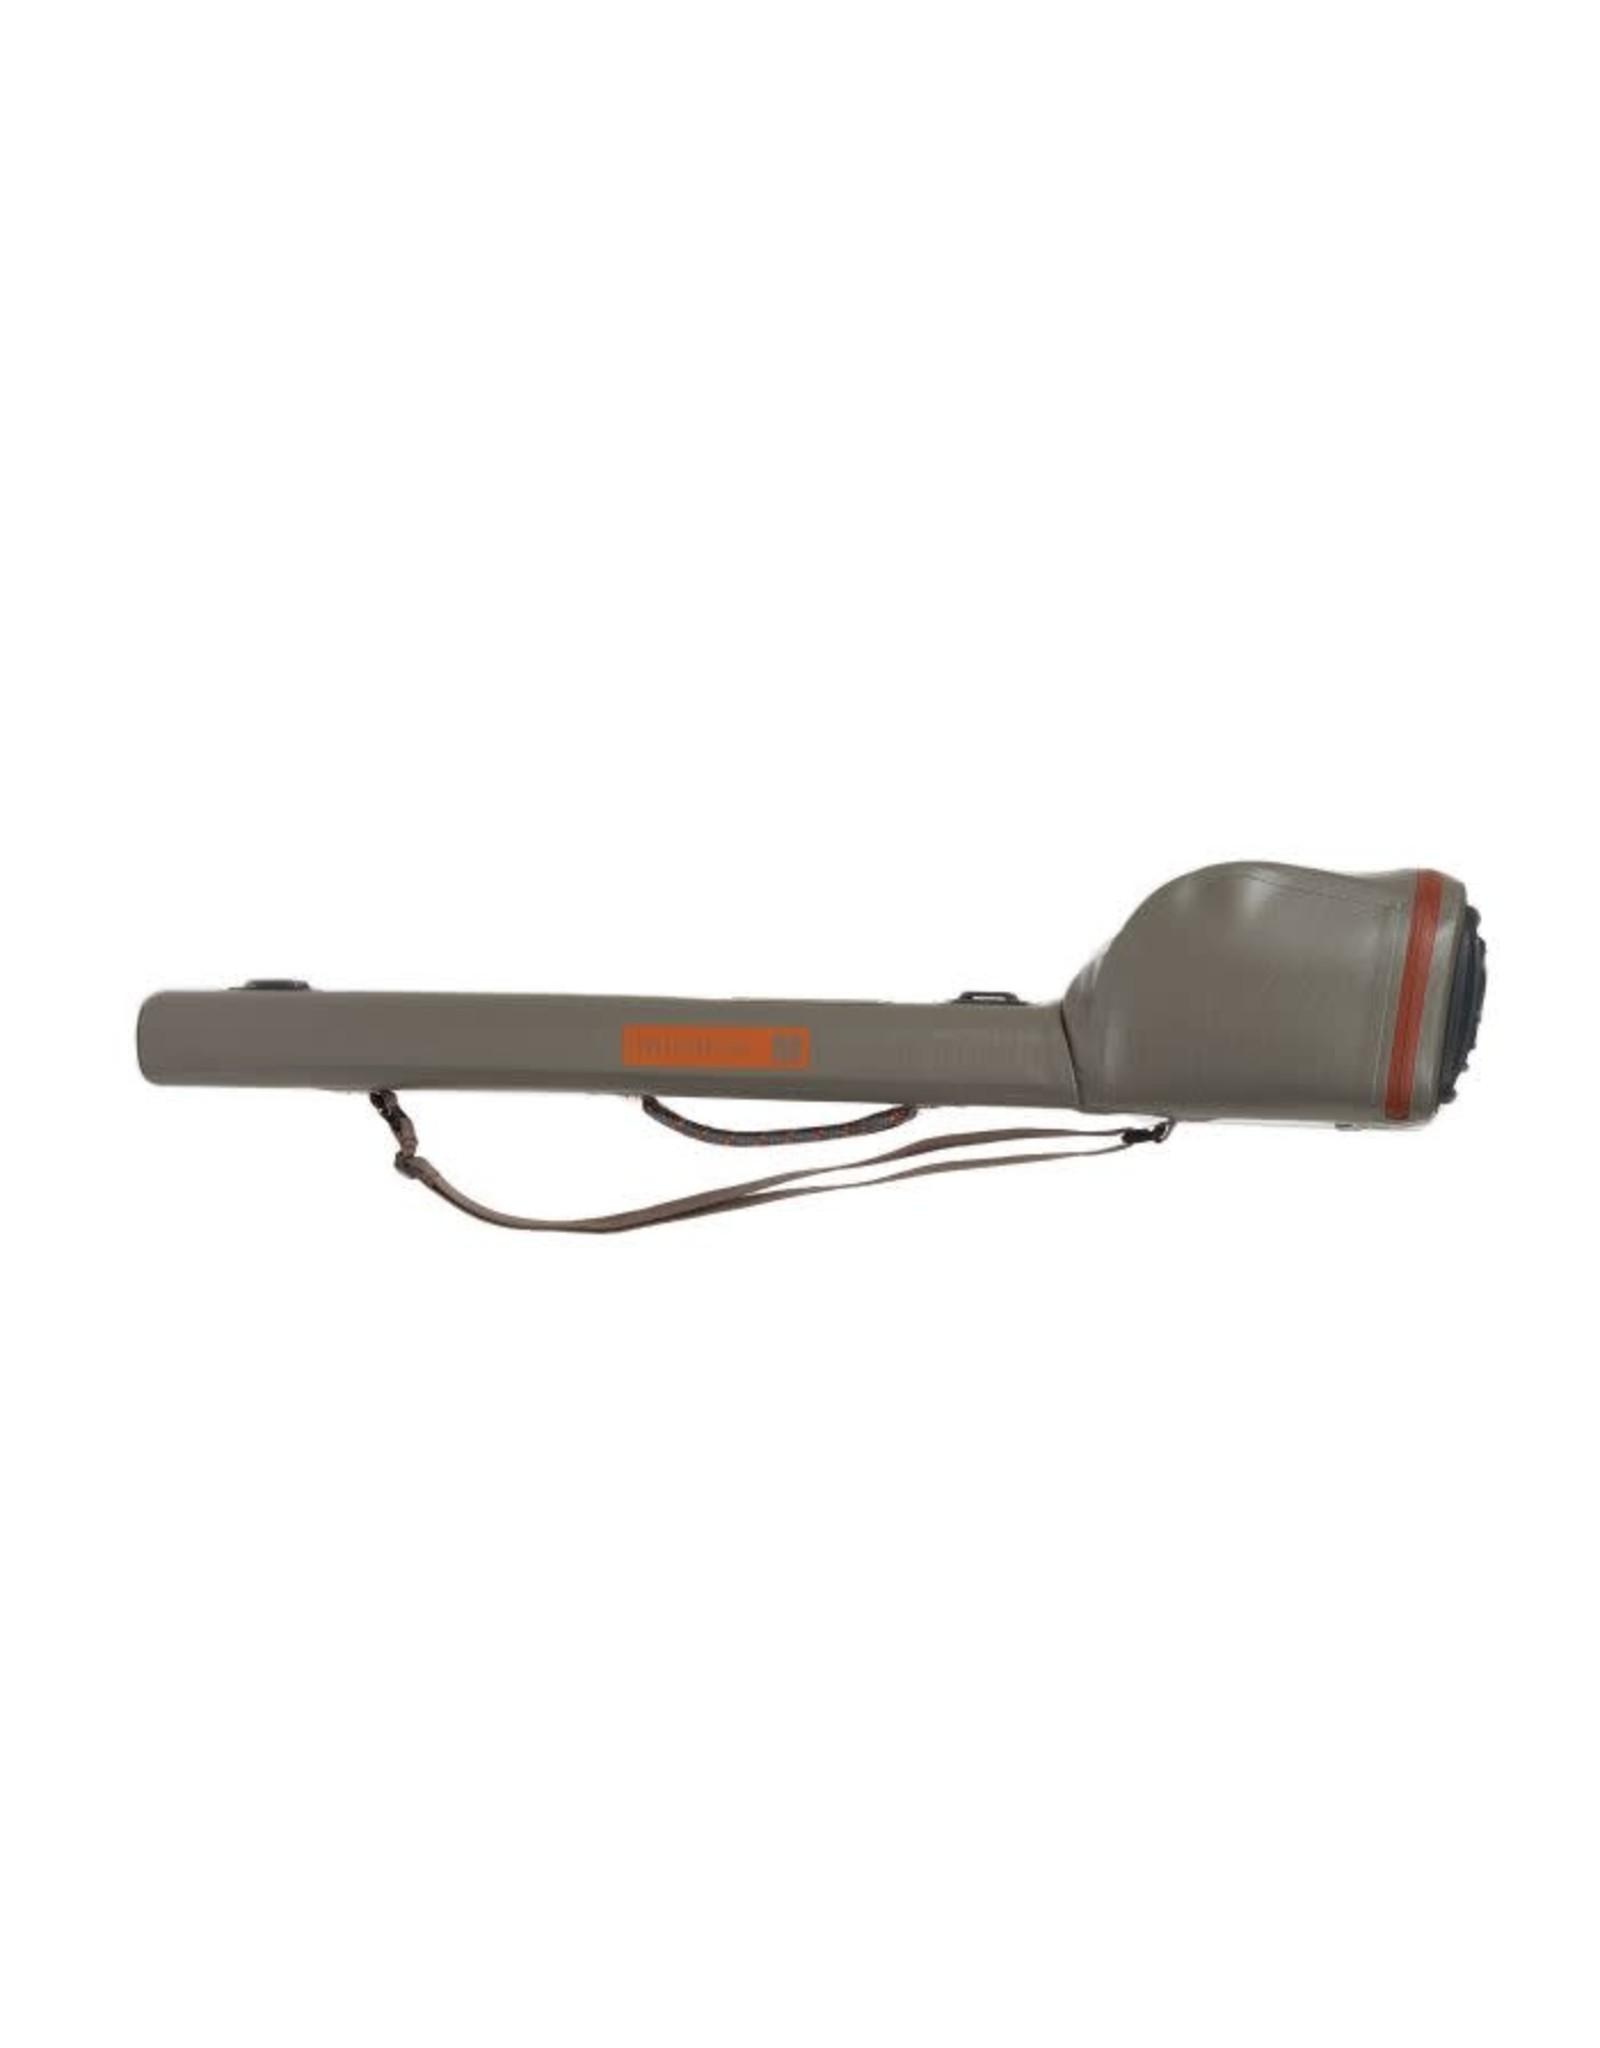 FISHPOND Fishpond Thunderhead Rod & Reel Case - 4 Piece Rods